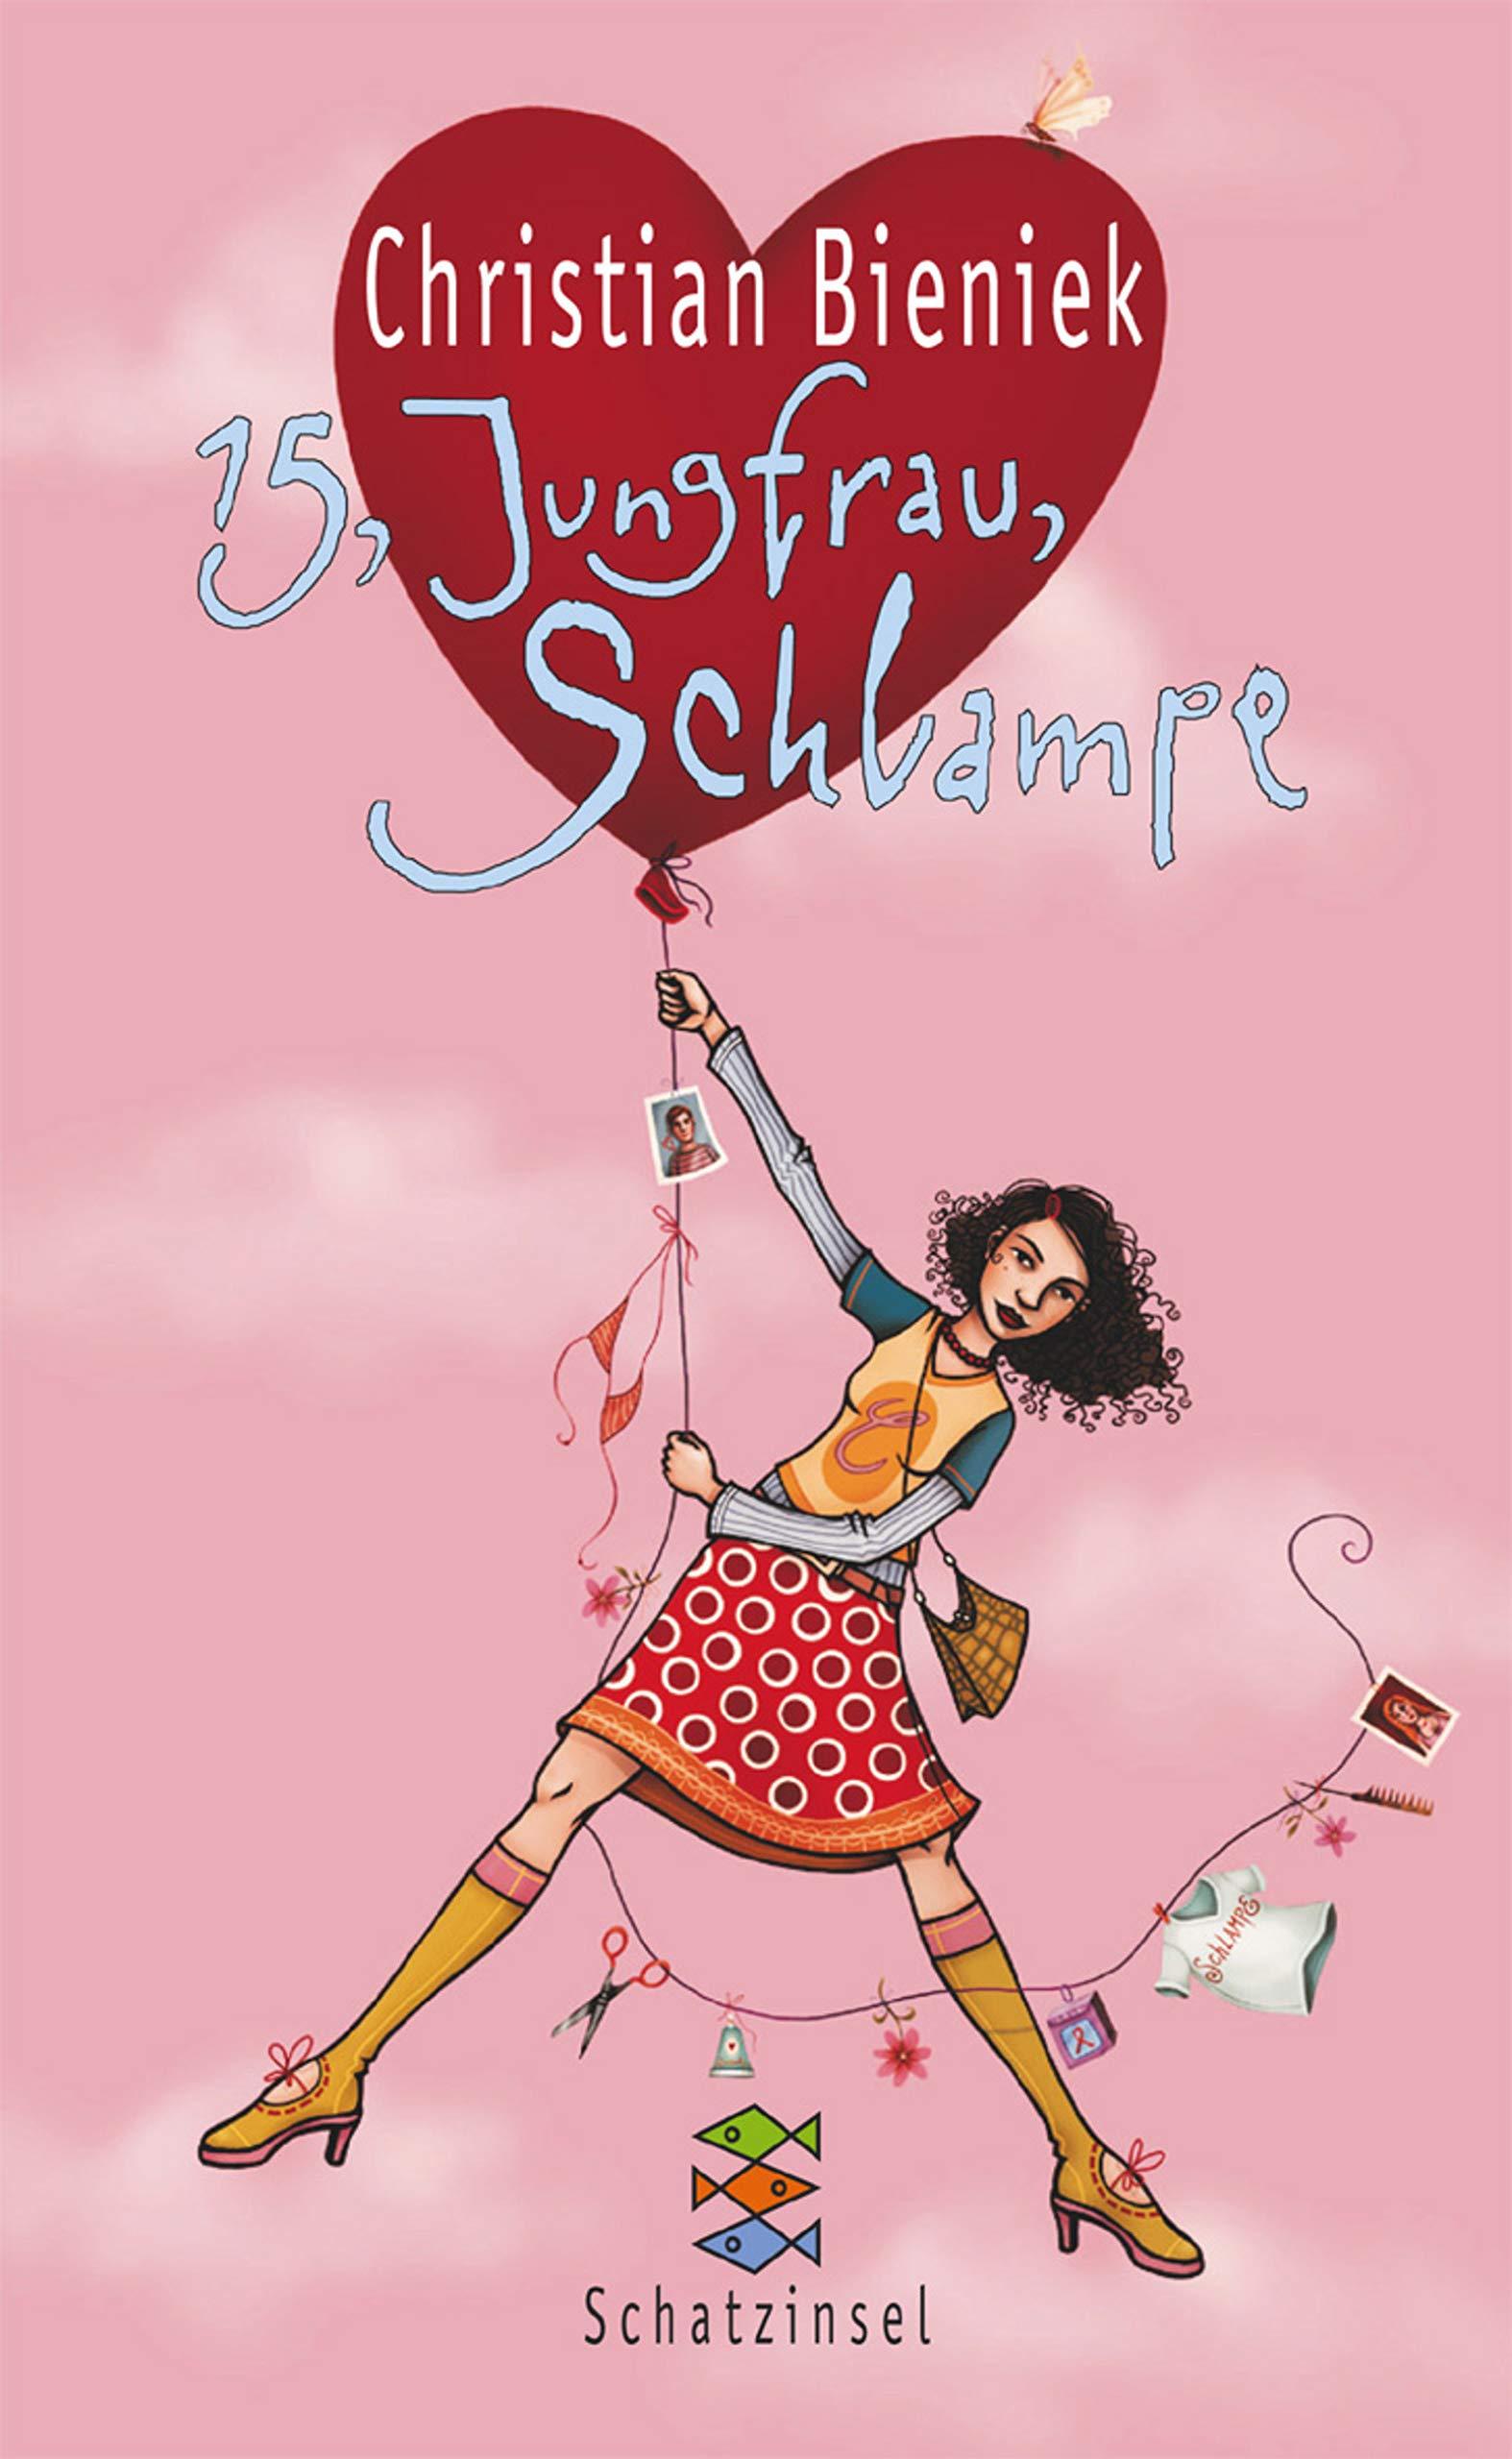 f65e149279 15, Jungfrau, Schlampe (Kinderbuch Hardcover): Amazon.de: Christian  Bieniek: Bücher